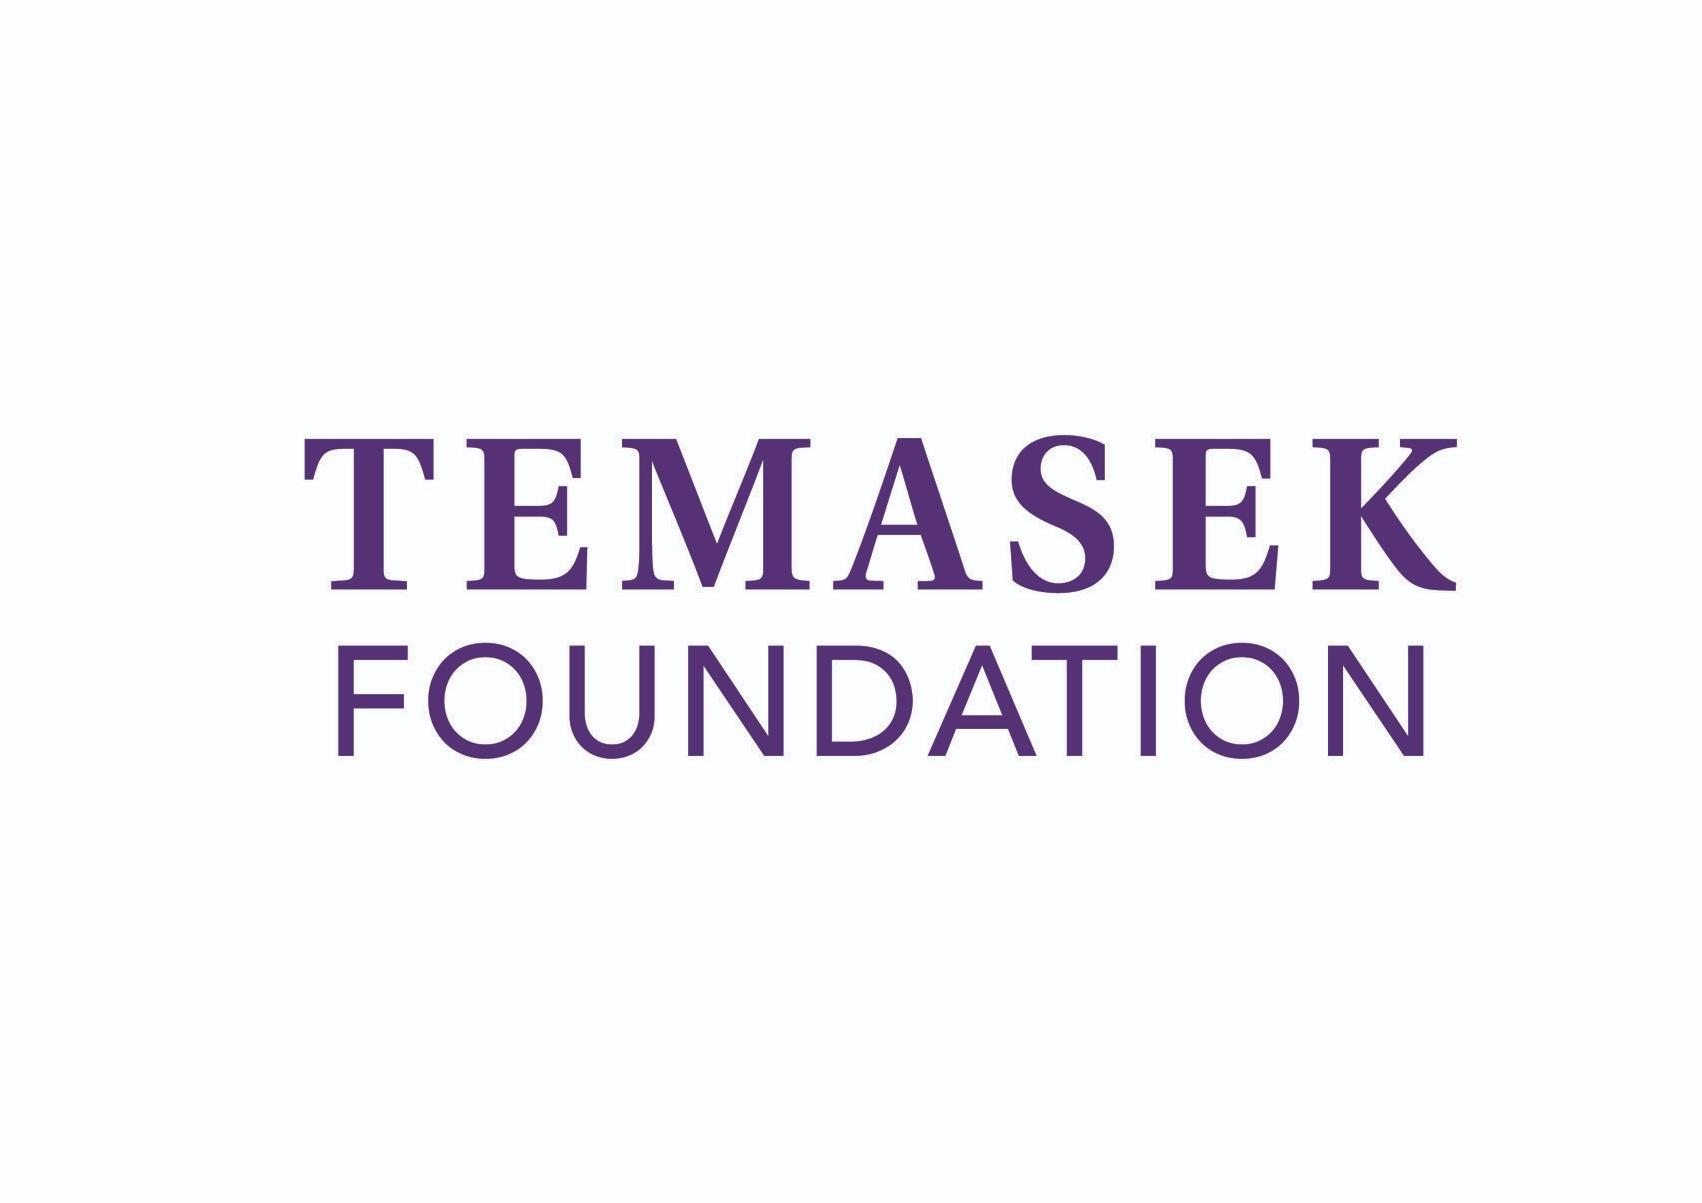 Temasek+Foundation_FC.jpg